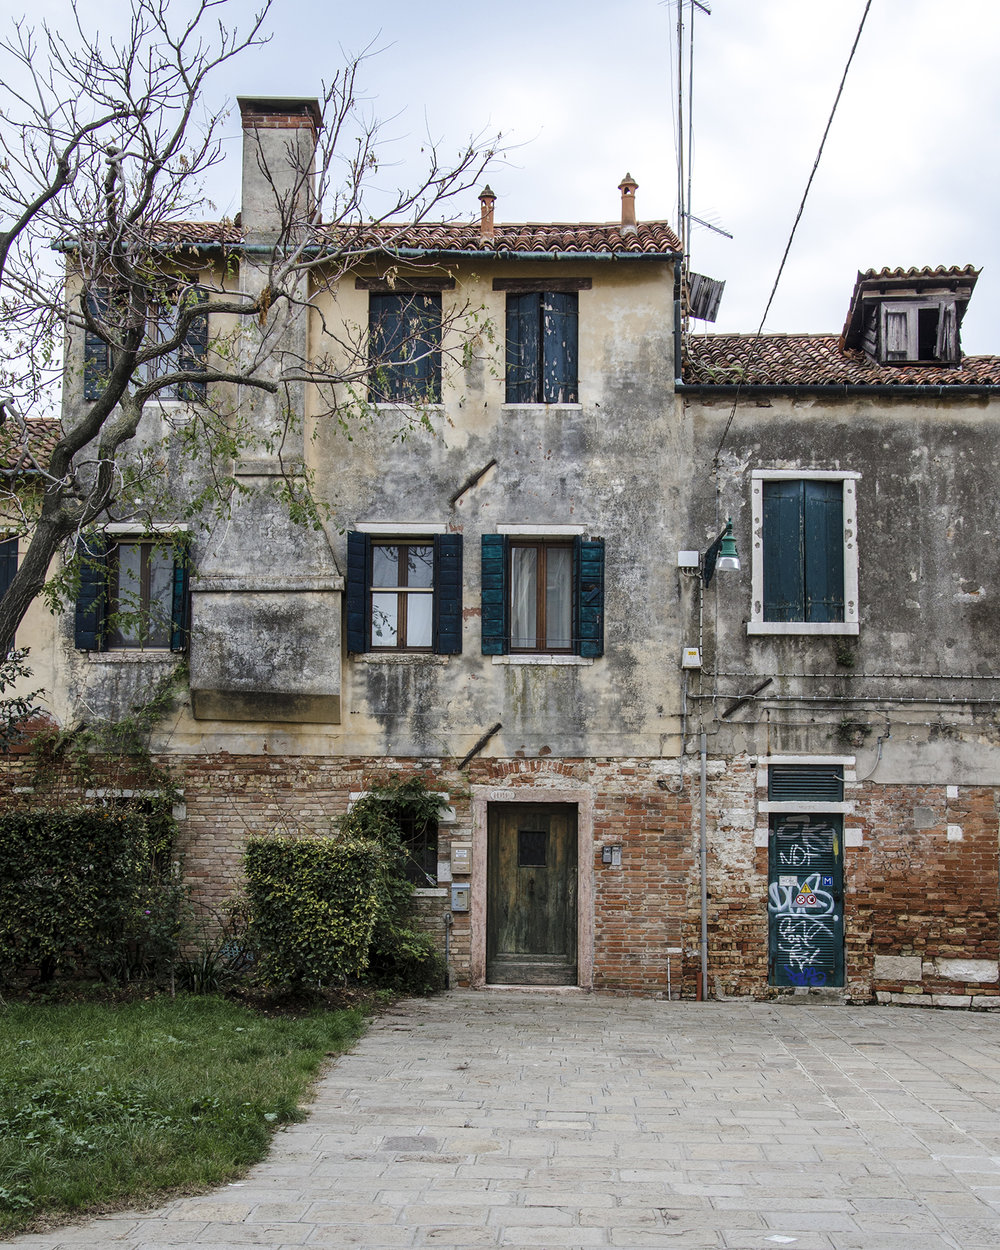 venezia popolana-6574.jpg